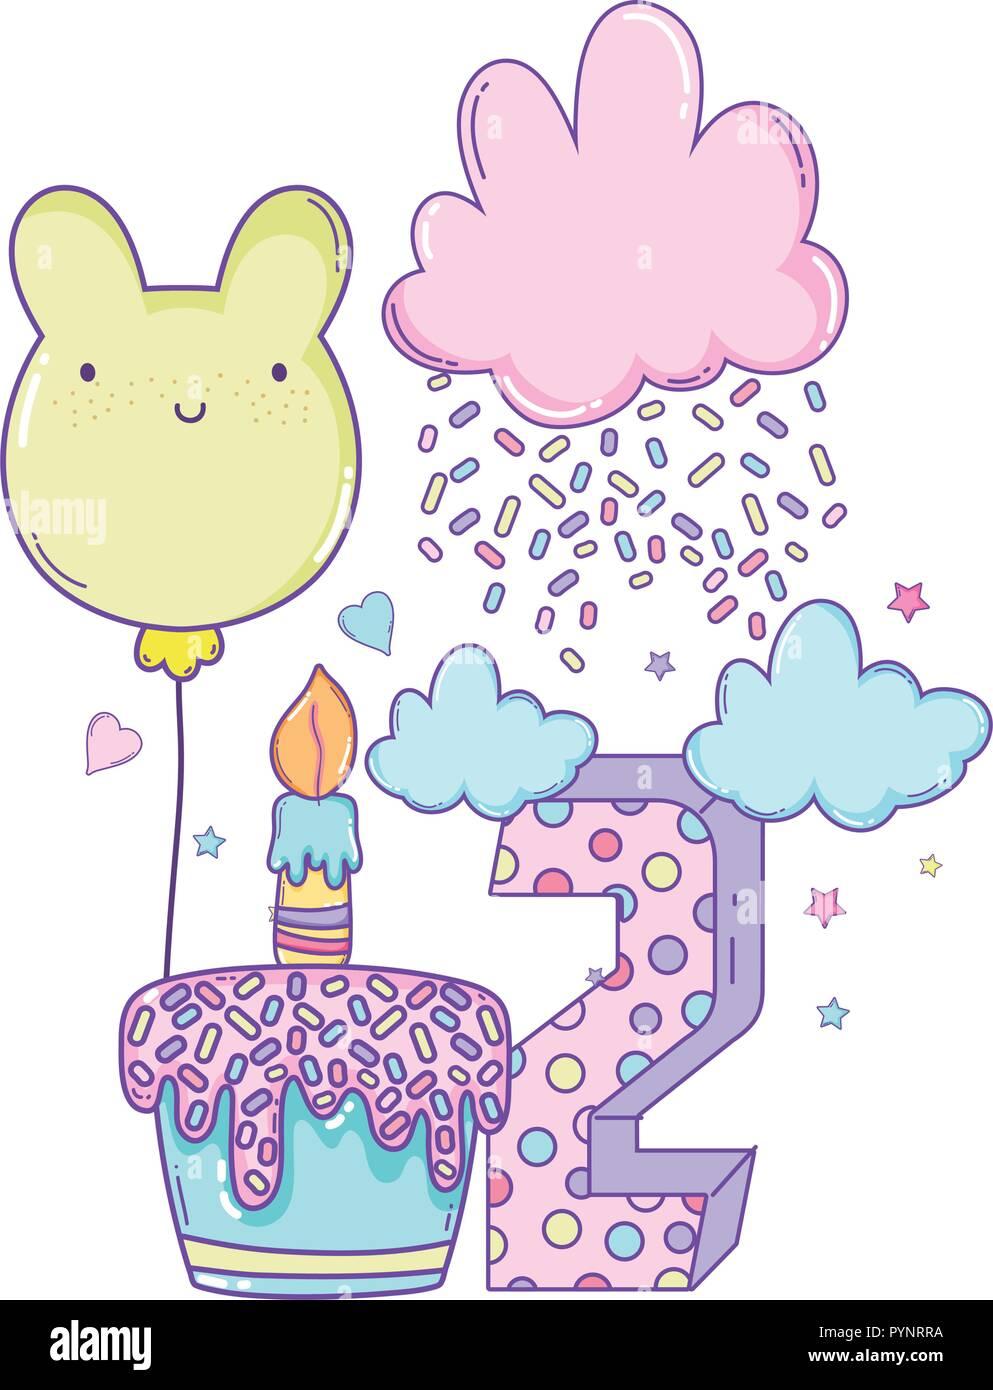 Happy birthday cartoons - Stock Image